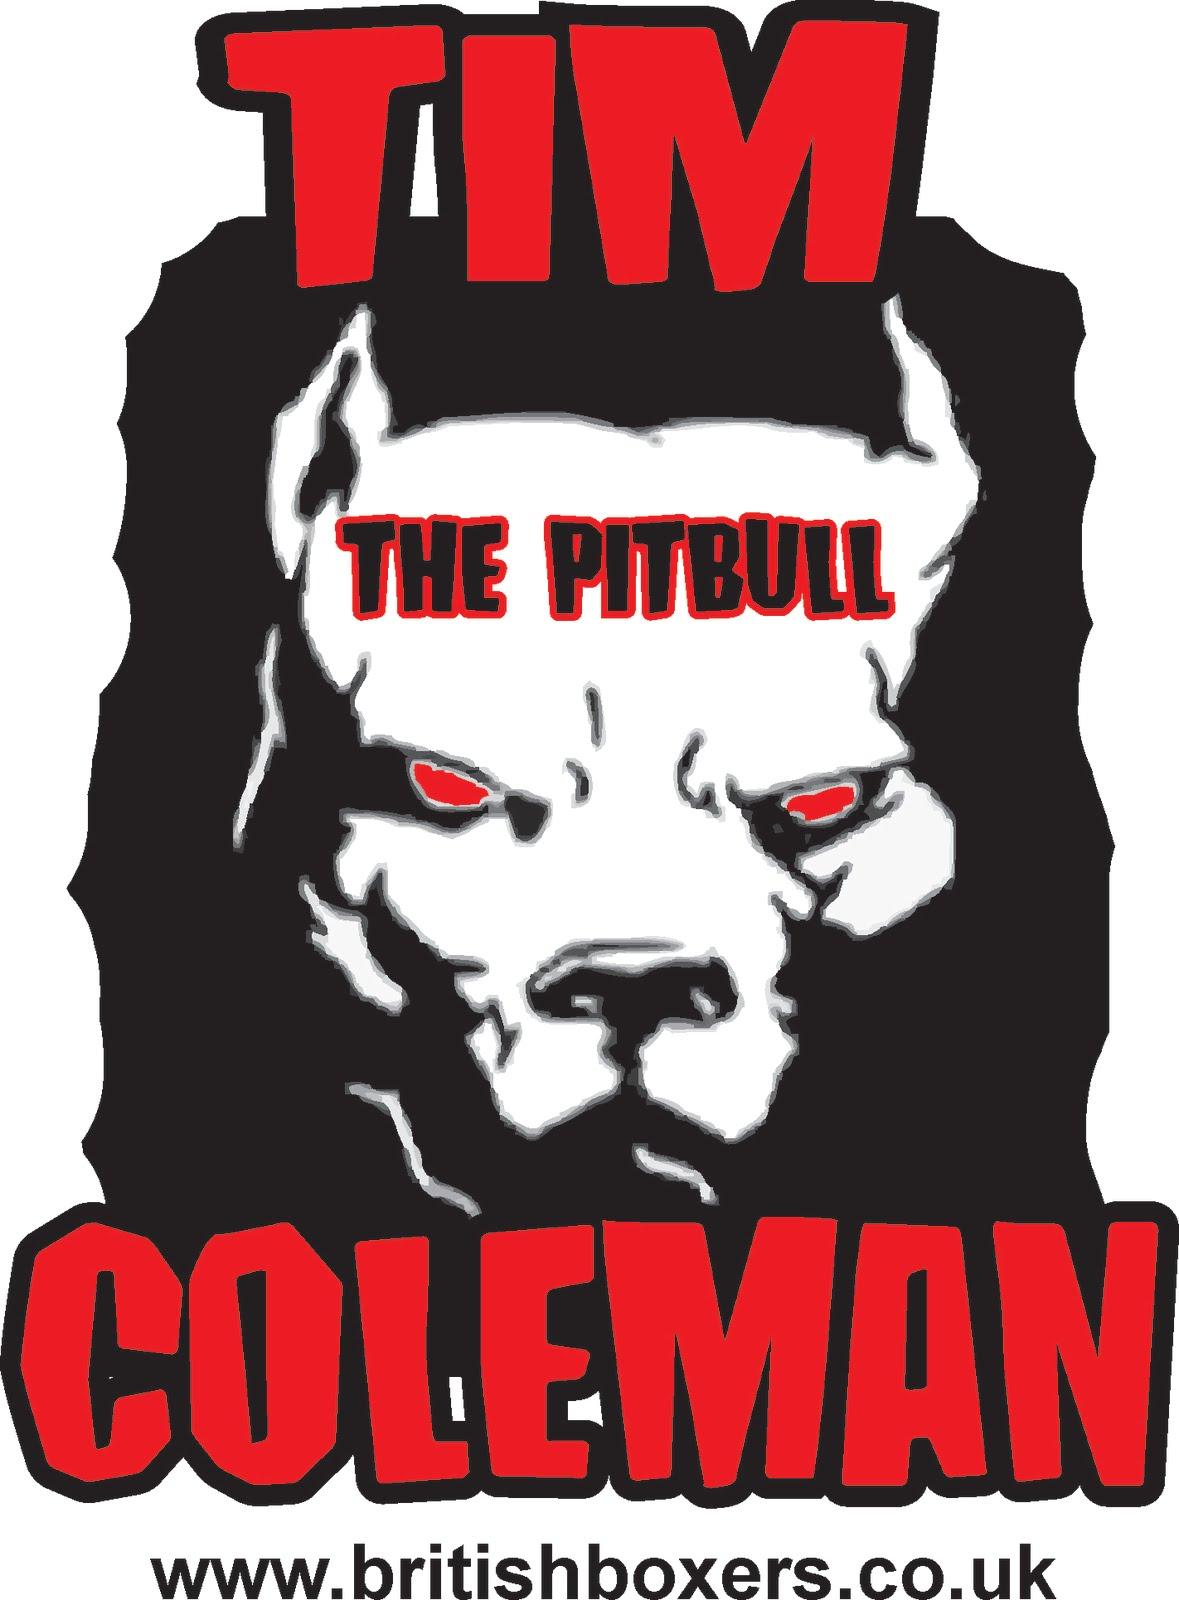 http://1.bp.blogspot.com/-ww_qgbOg5qc/TaY3XPekiZI/AAAAAAAAFSo/tgEGLRcKN4I/s1600/tim+pitbull+coleman.jpg